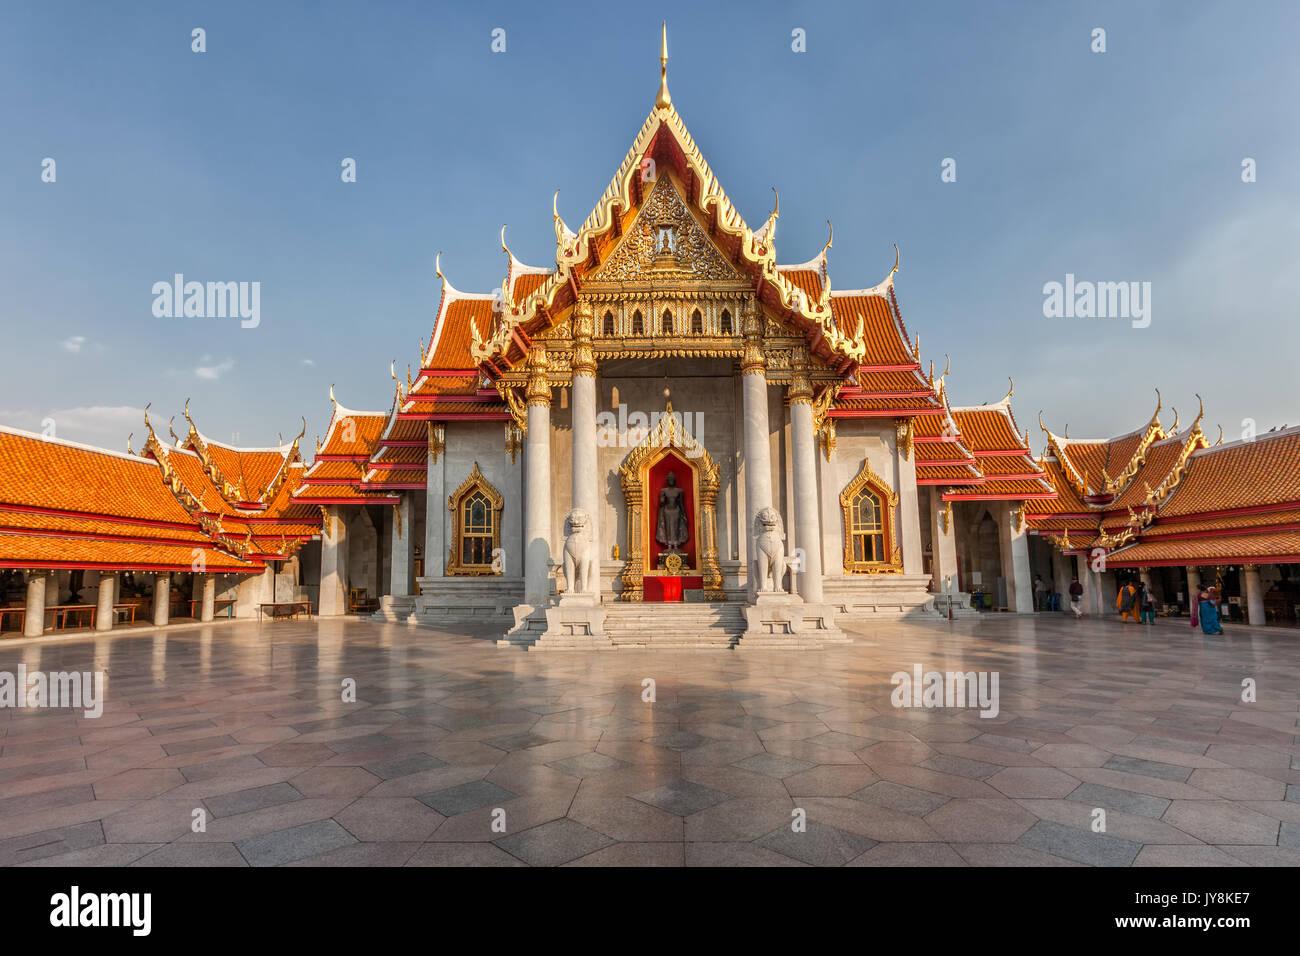 The Marble Temple at sunset, Bangkok, Thailand Stock Photo